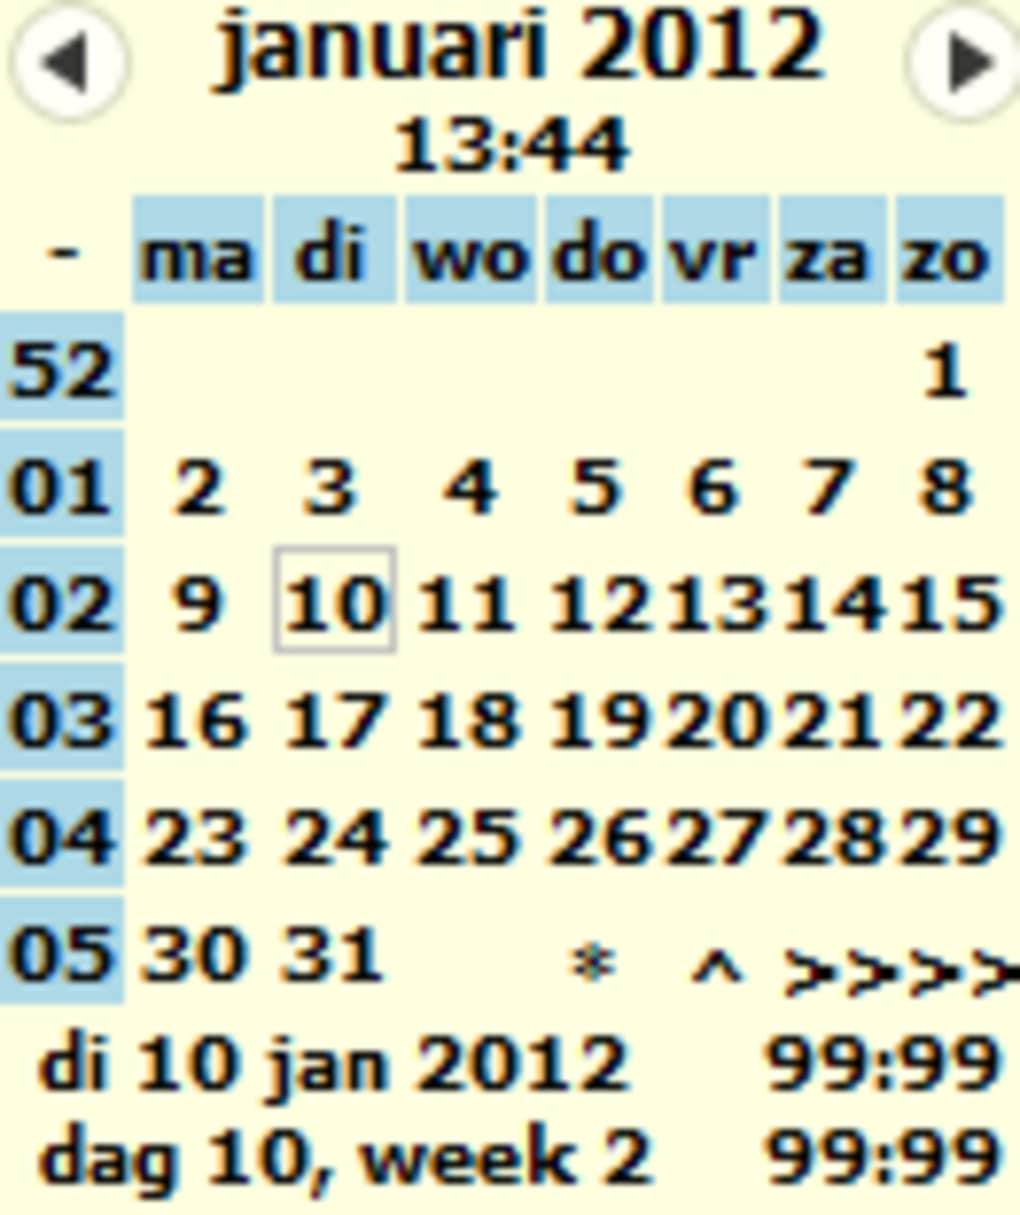 Kalender/Agenda